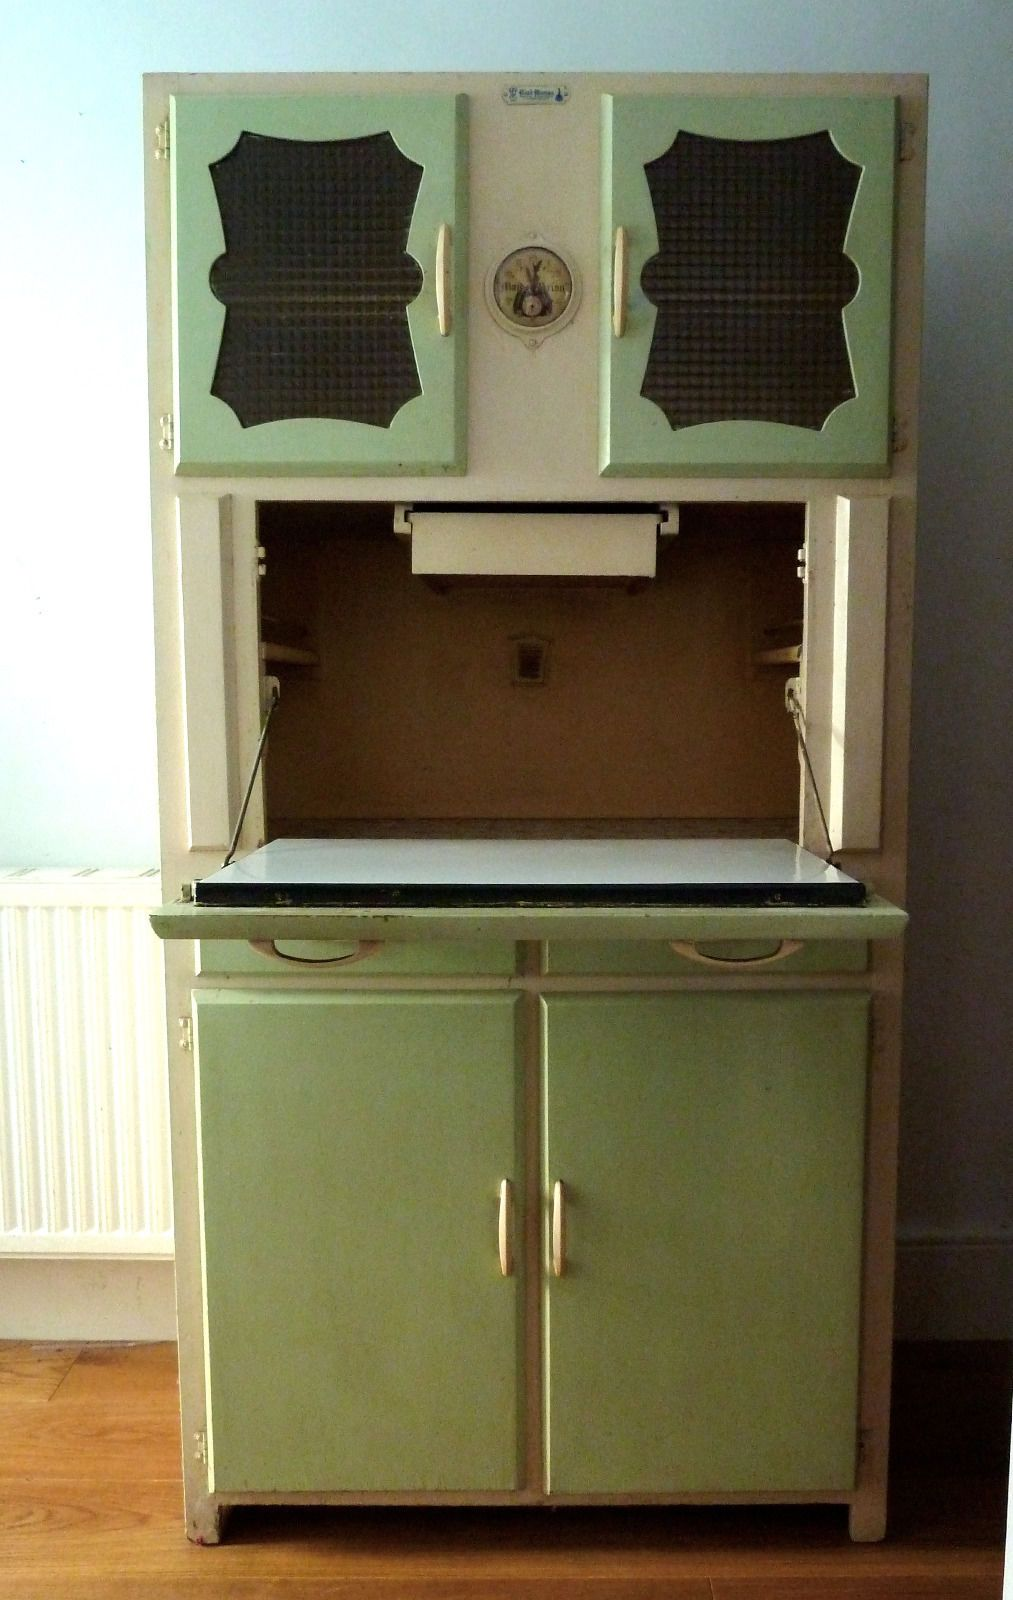 Vintage Maid Marion Retro Kitchen Kitchenette Unit